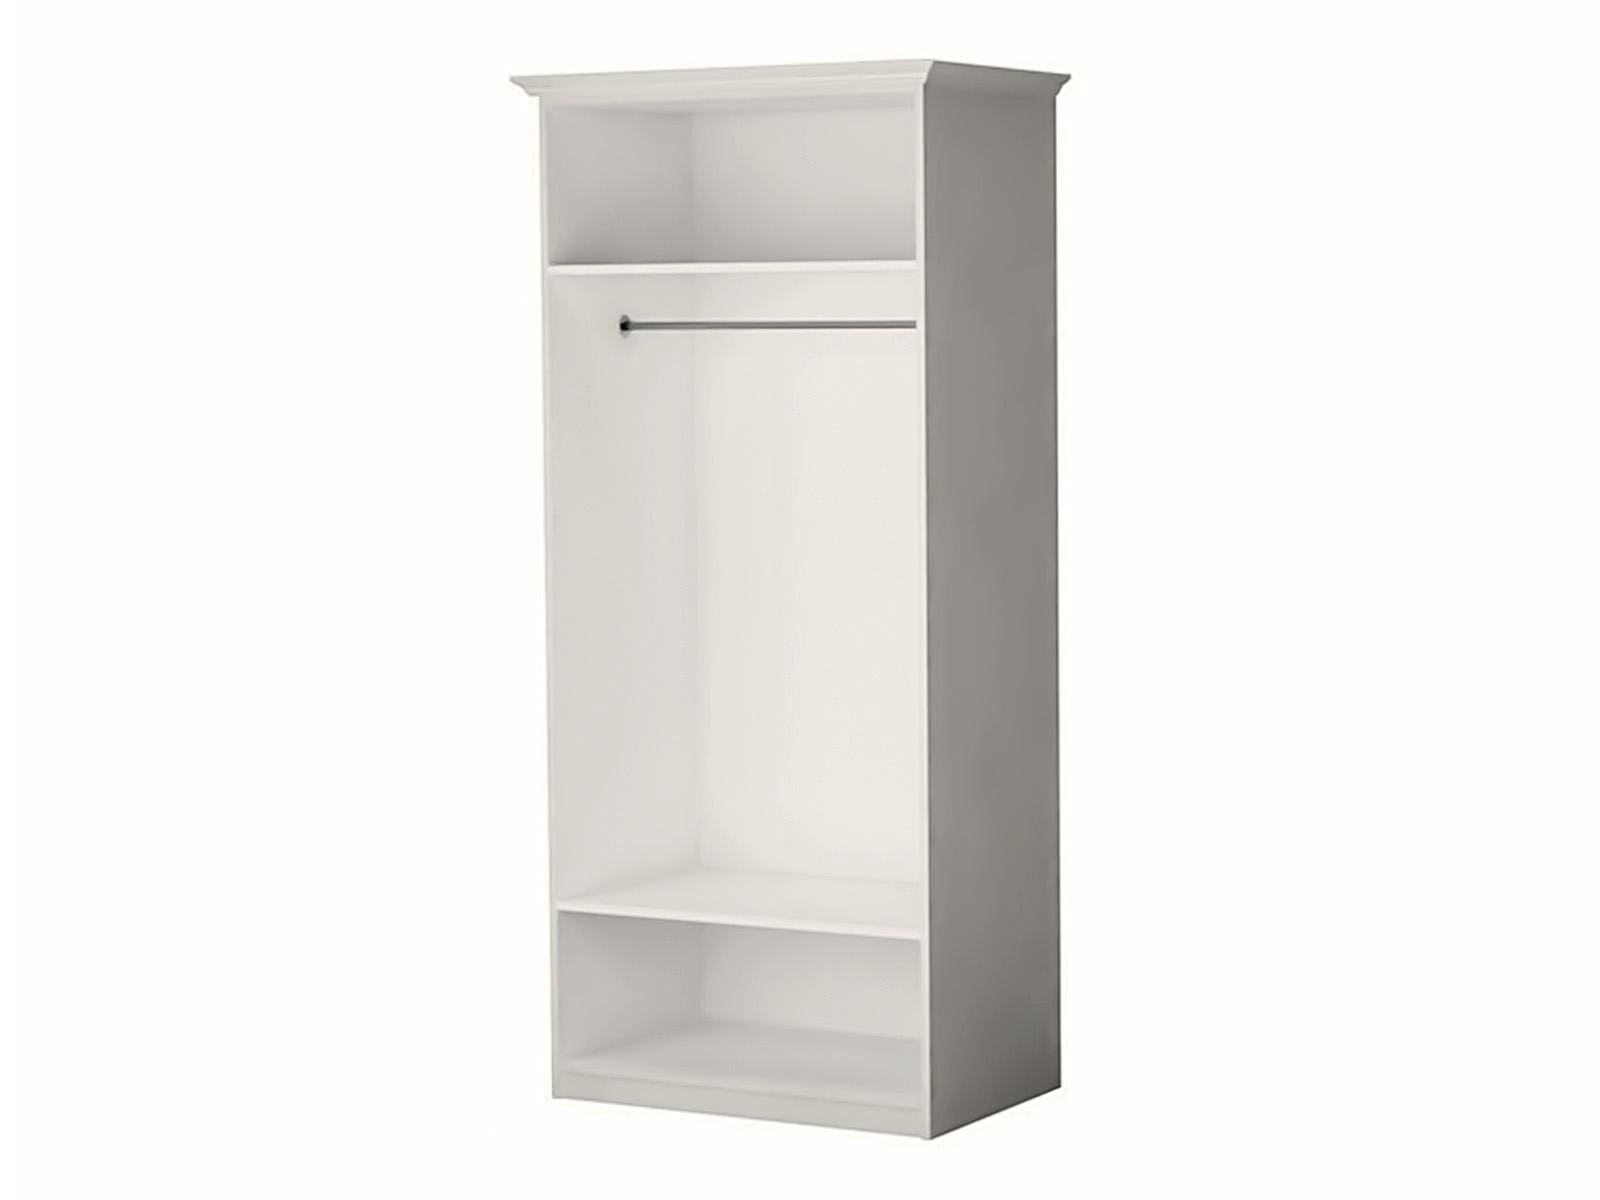 Шкаф 2-дверный Леди Роза - фото